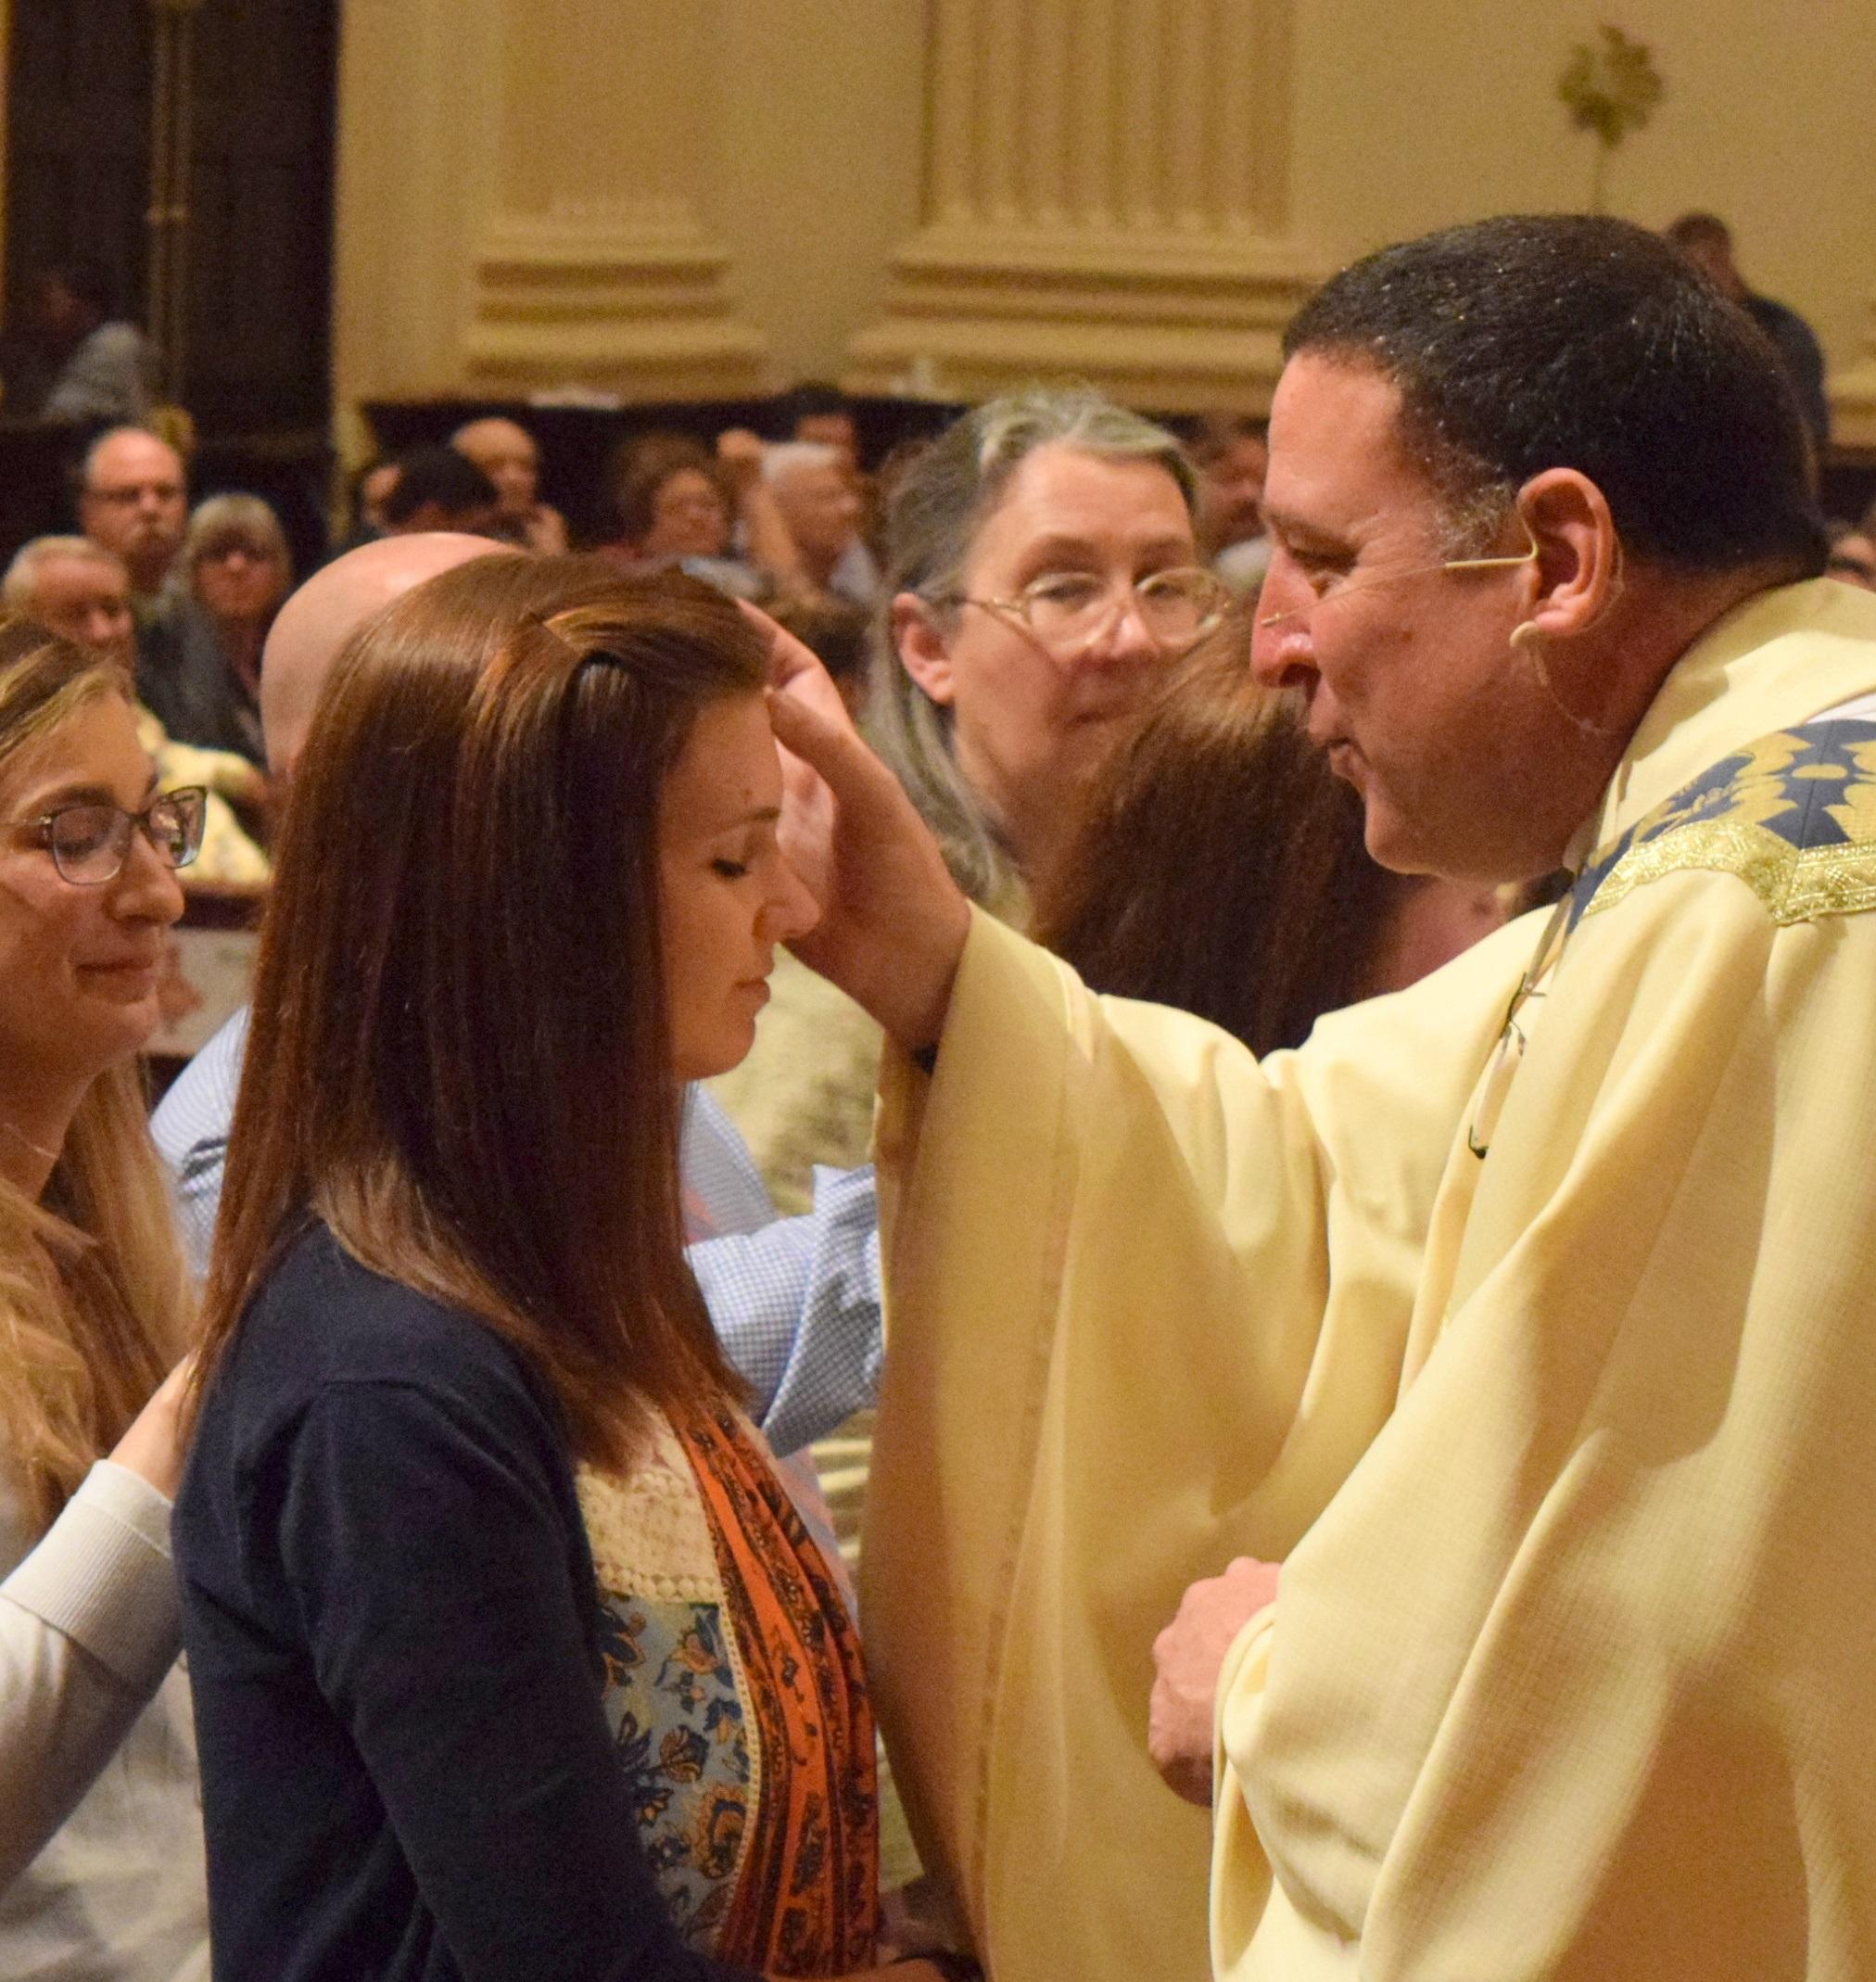 Fr. Kevin blessing candidate.jpg